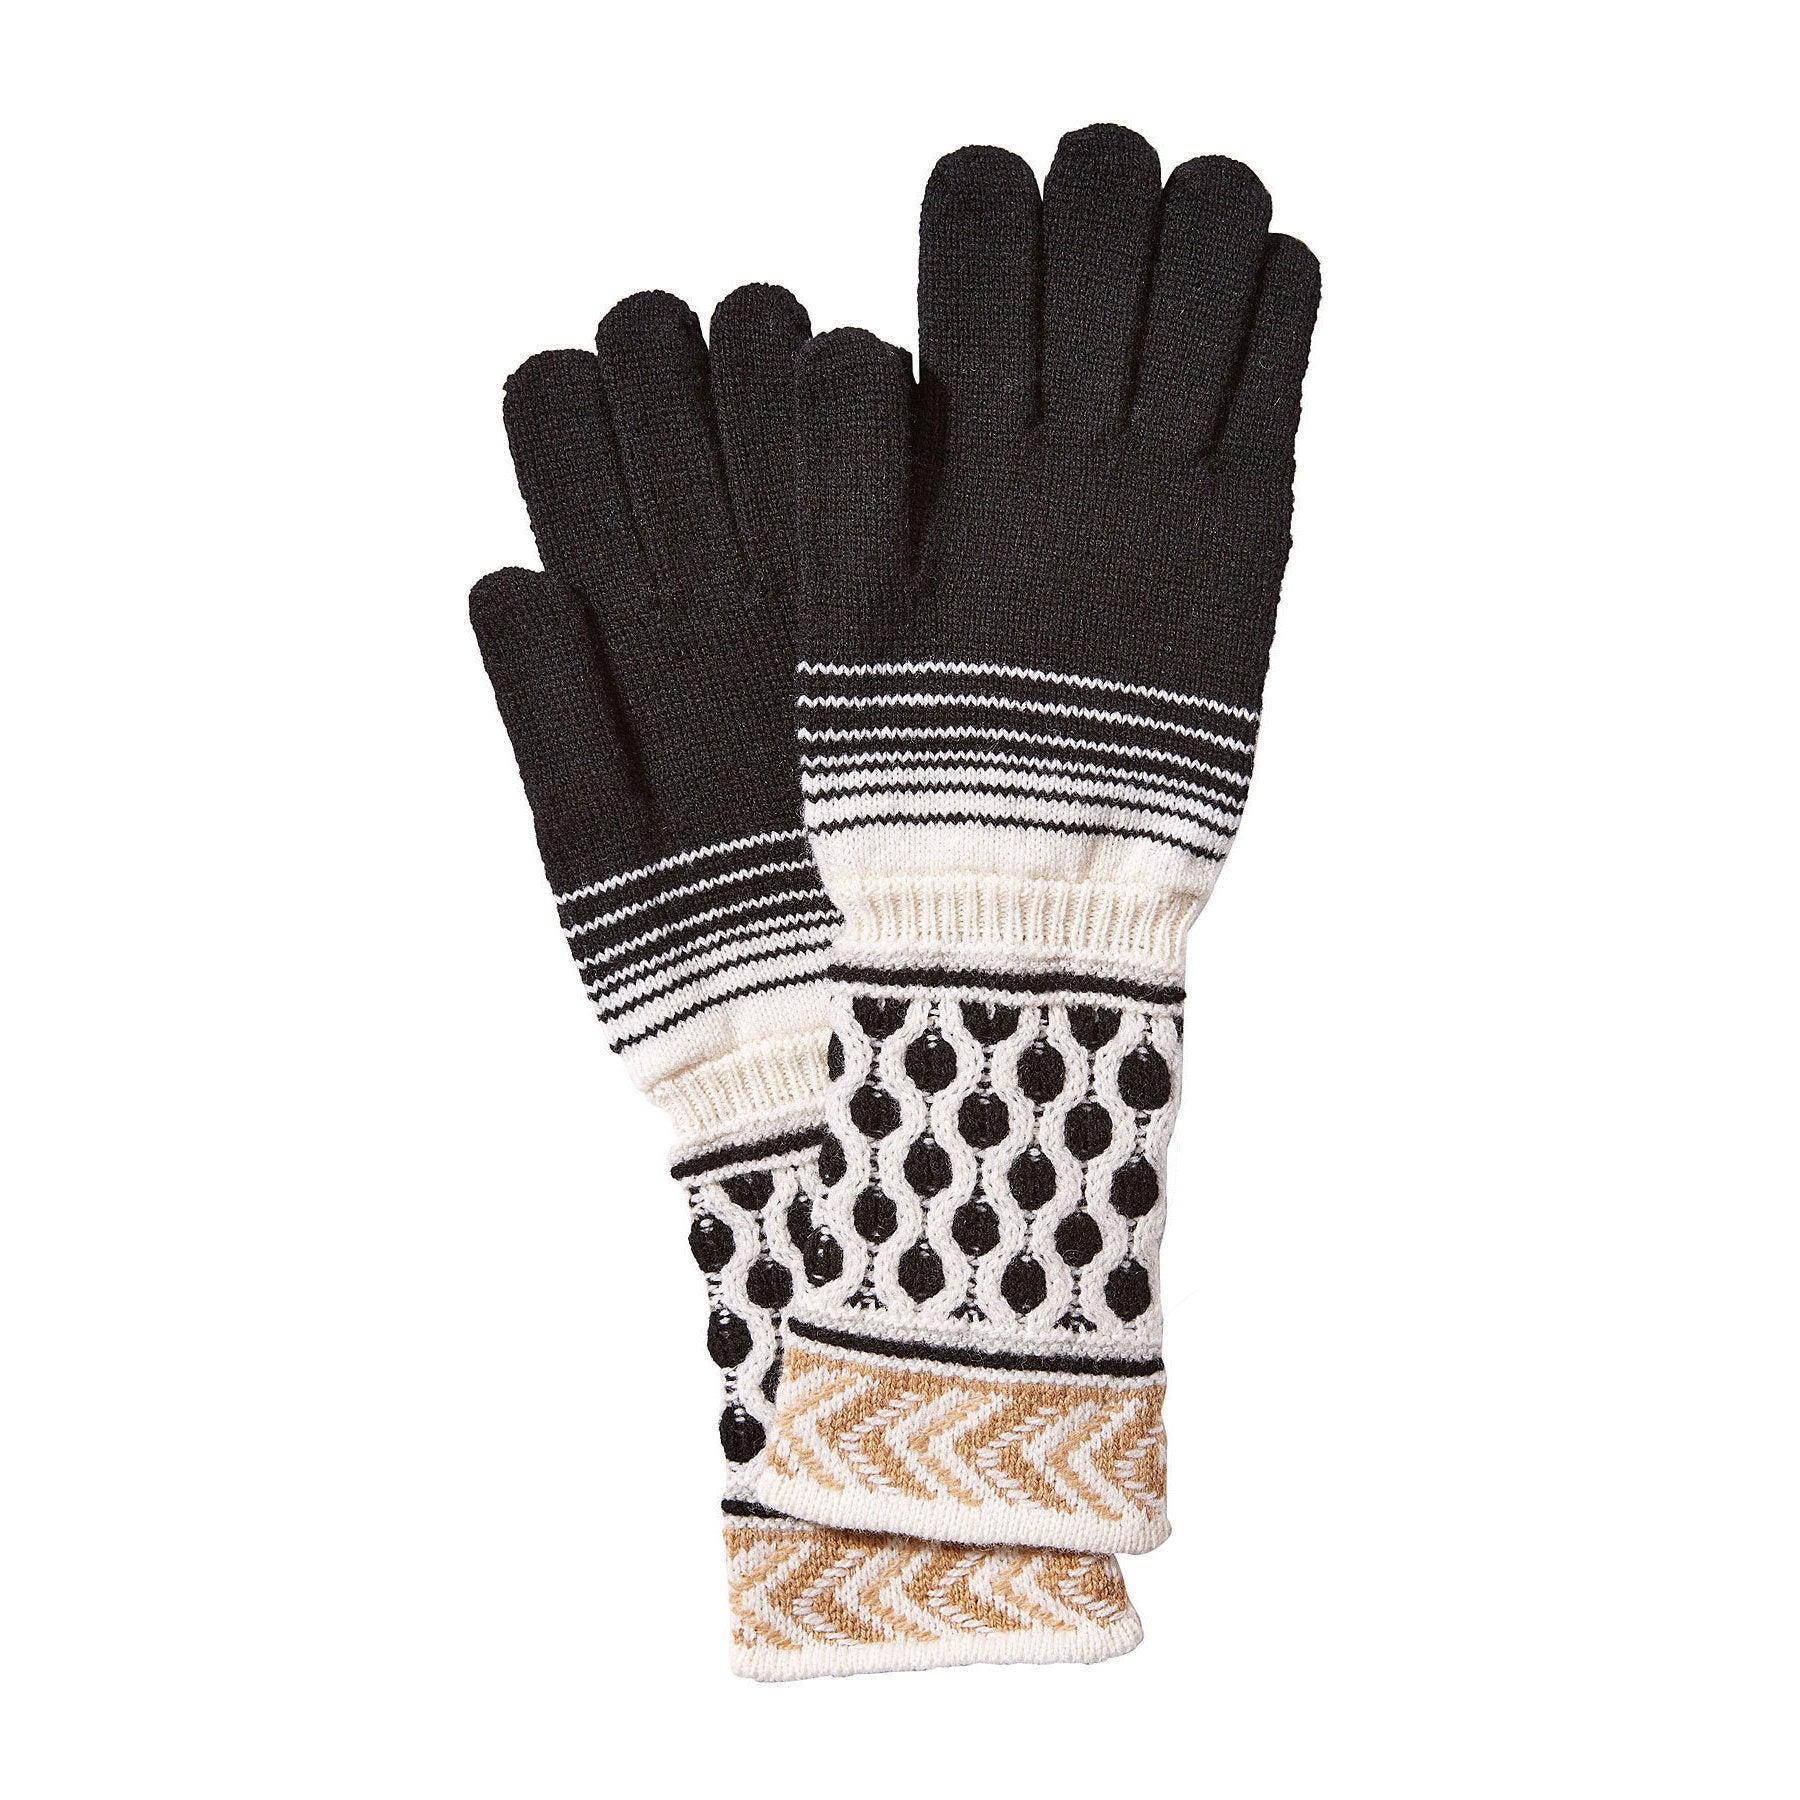 Missoni Black and Beige 100% Wool Gloves (Missoni Gloves)...